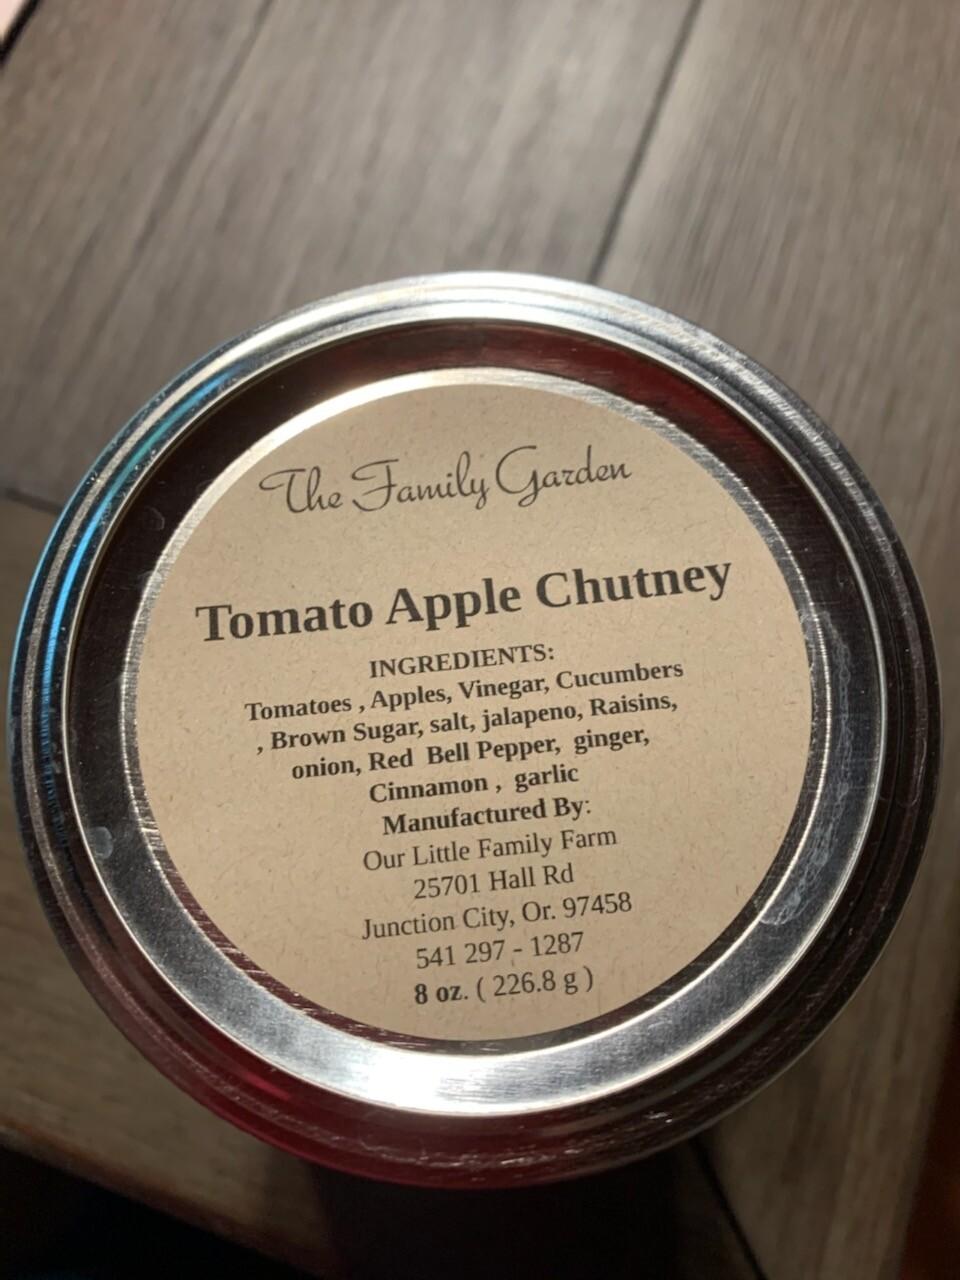 The Family Garden Tomato Apple Chutney